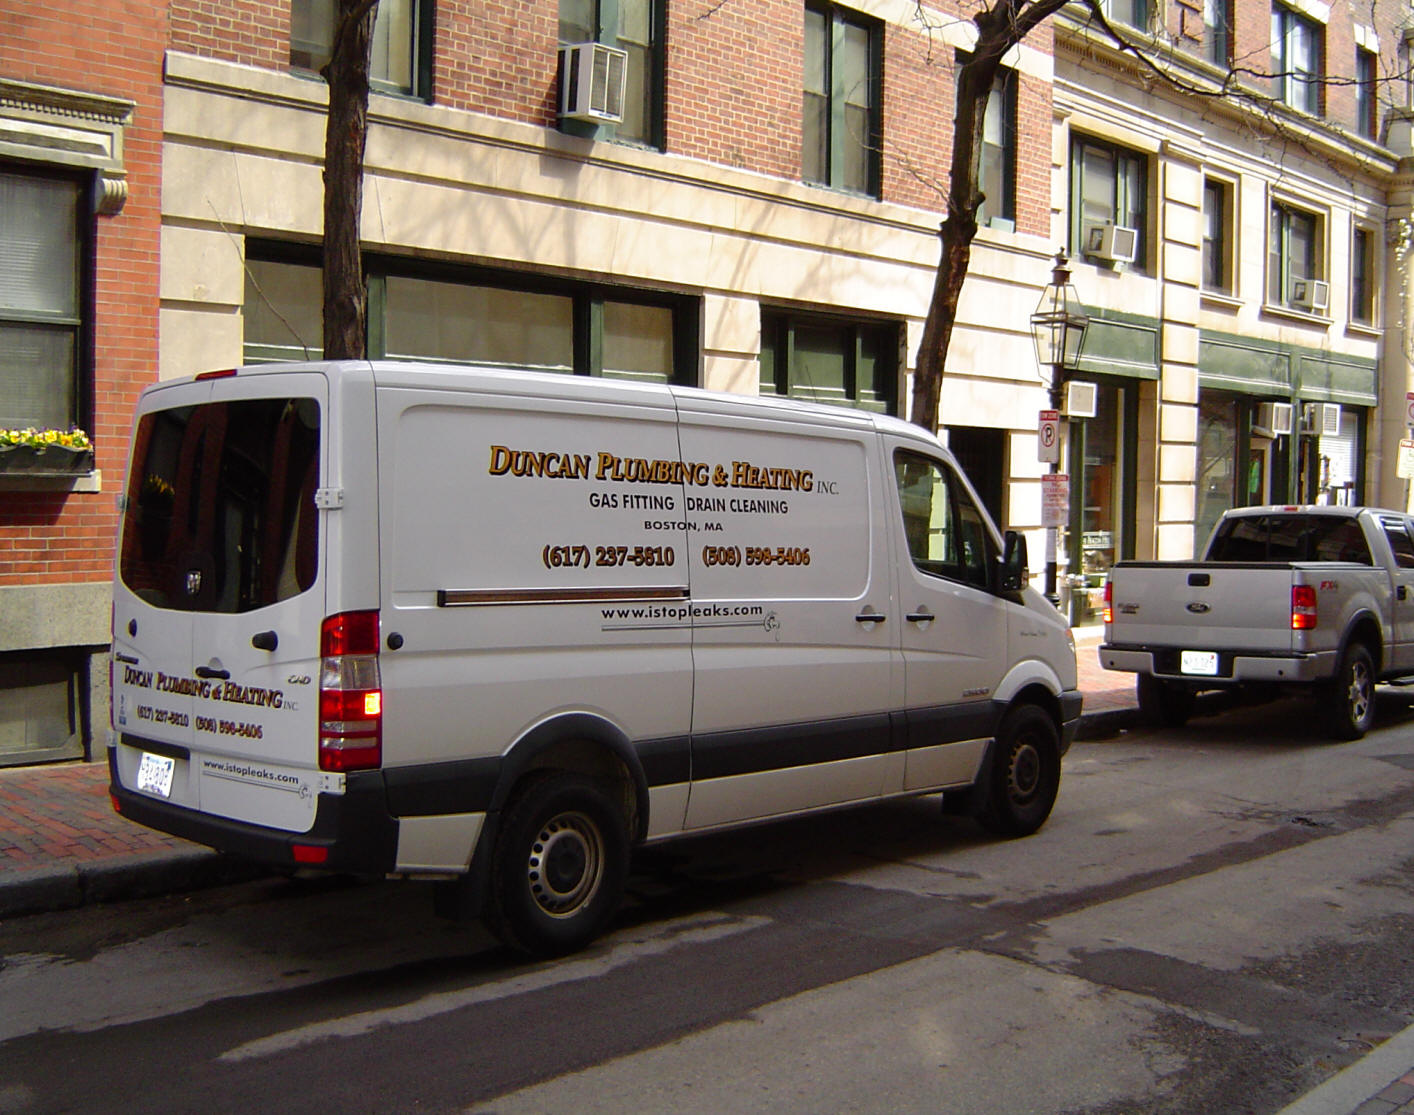 img landscape it happen our services renovations excavation duncan makes plumbing baker keep get excavator your an